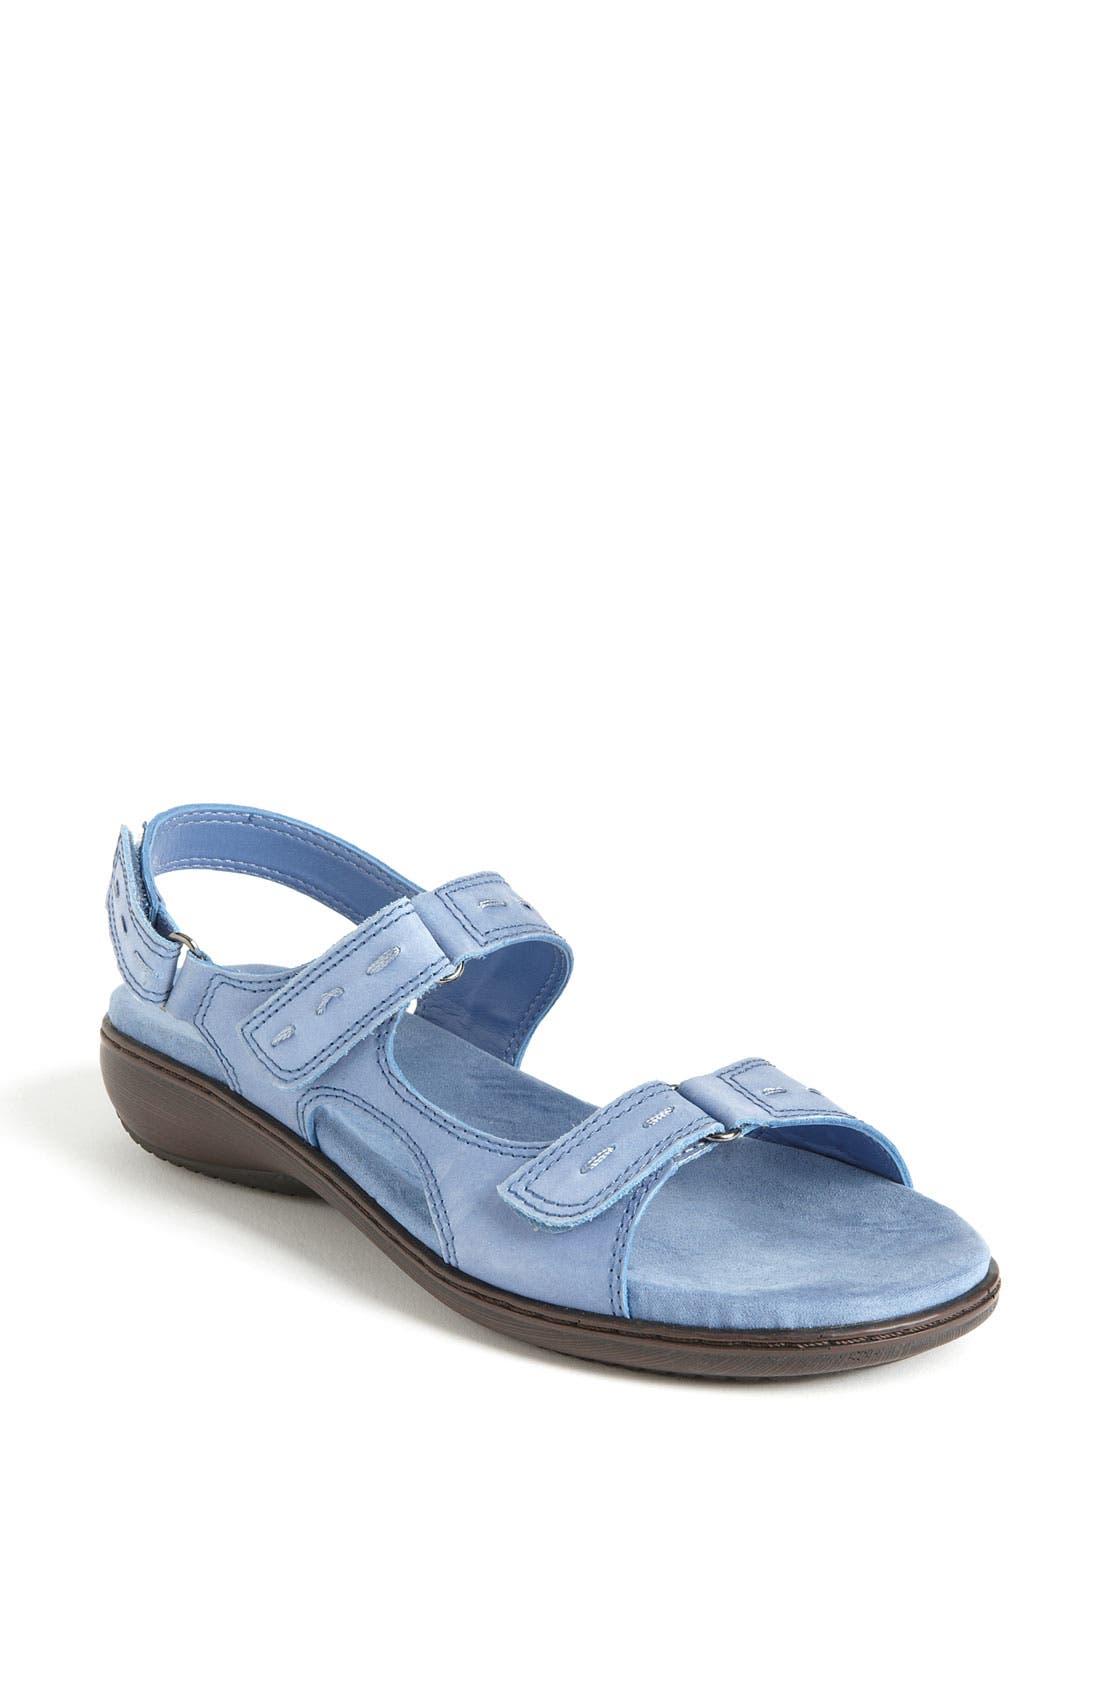 Main Image - Trotters 'Katie' Sandal